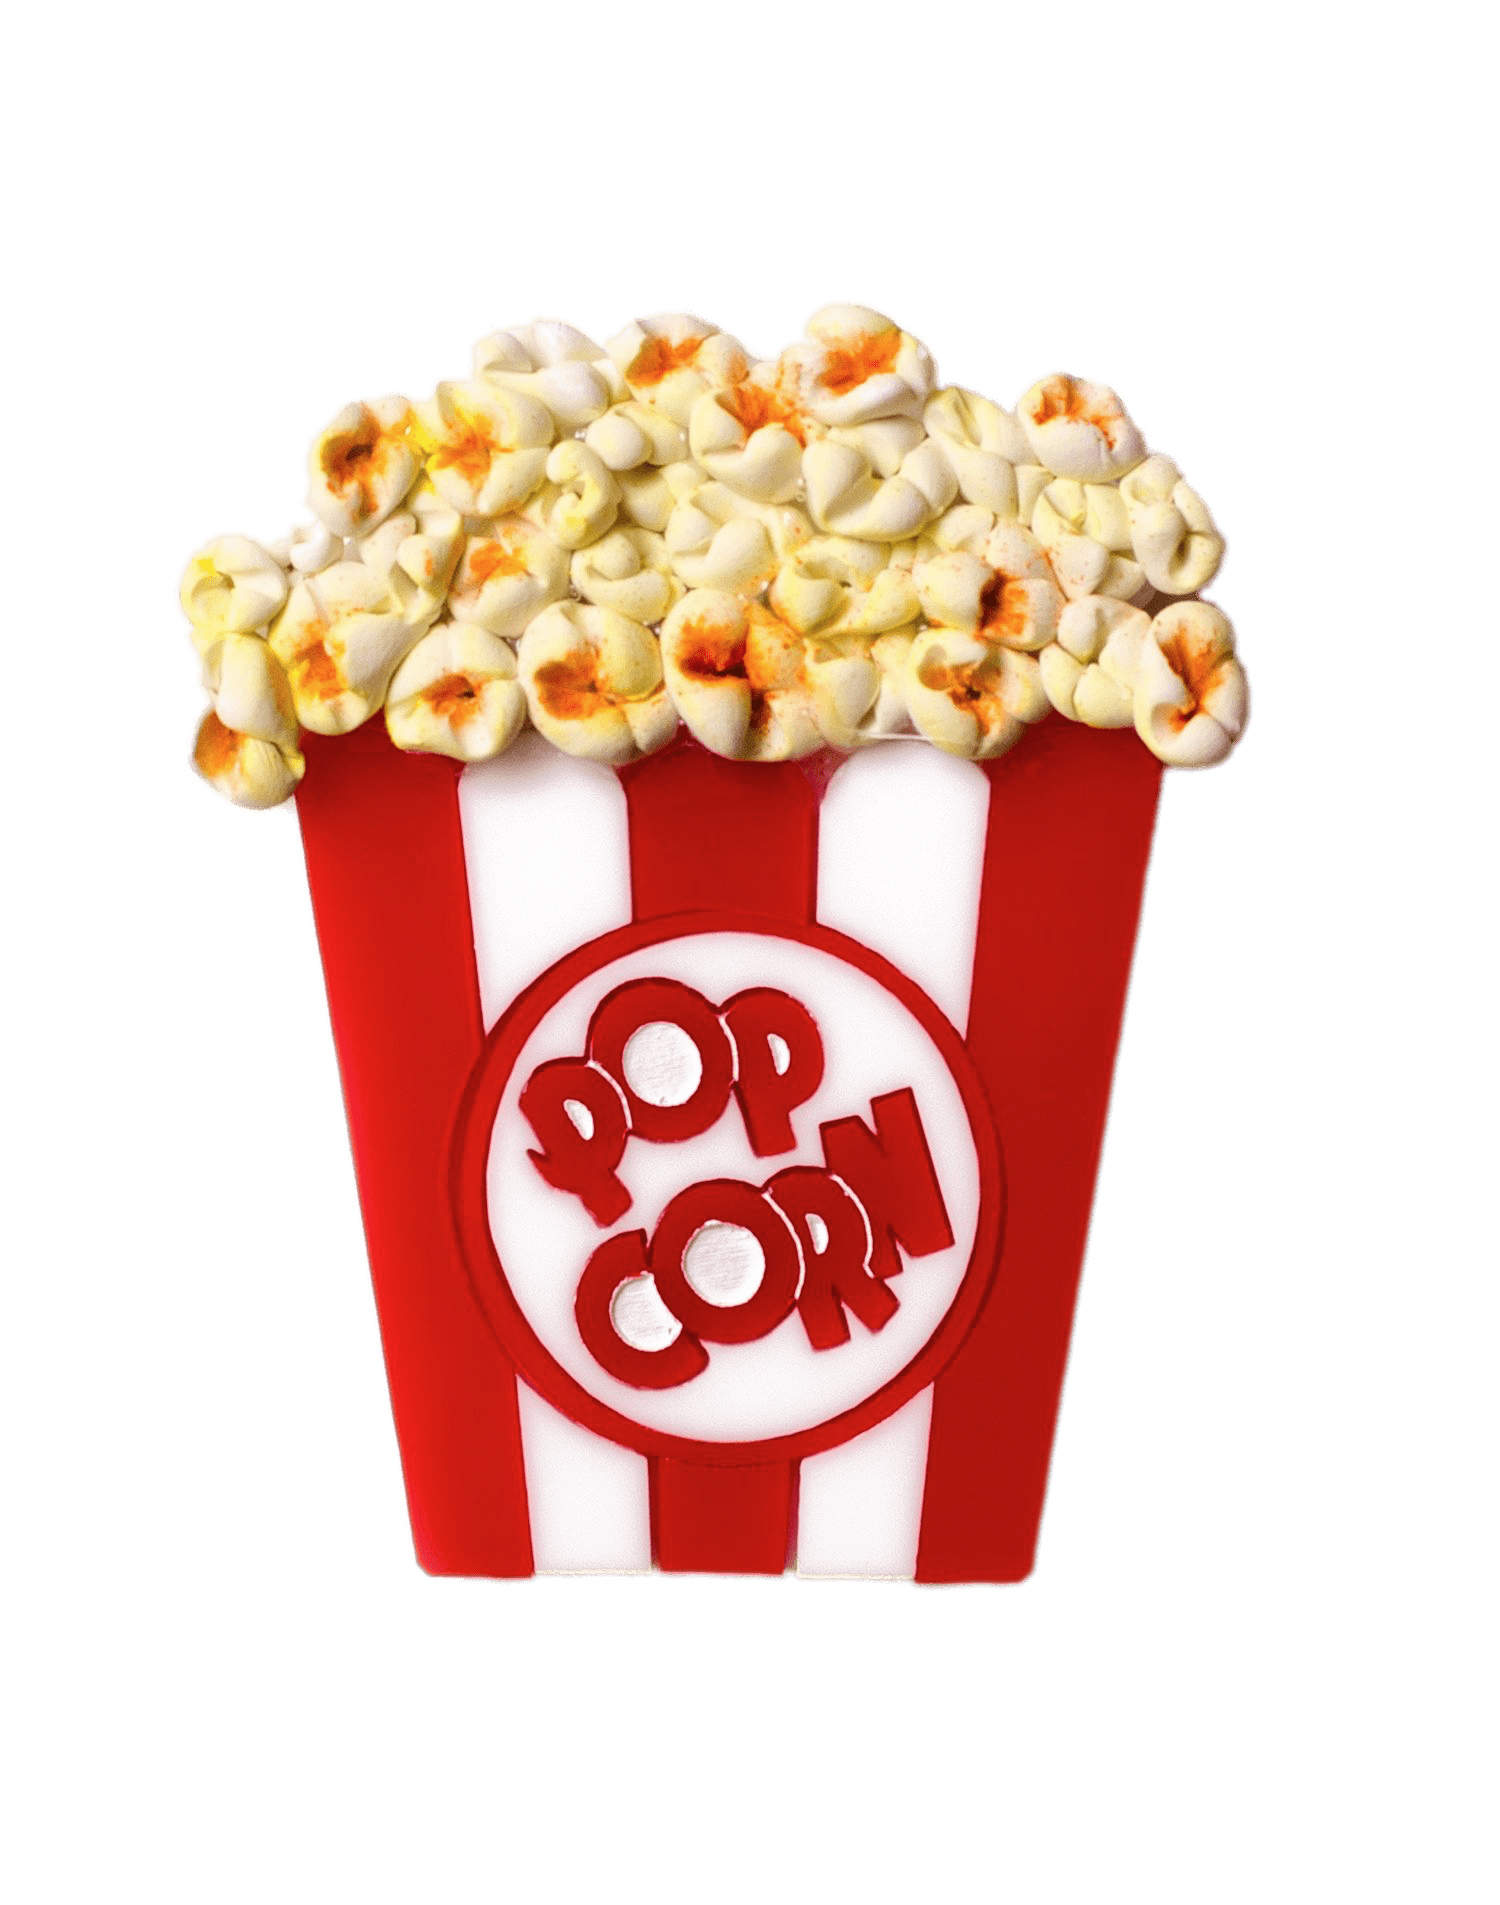 Popcorn Transparent File